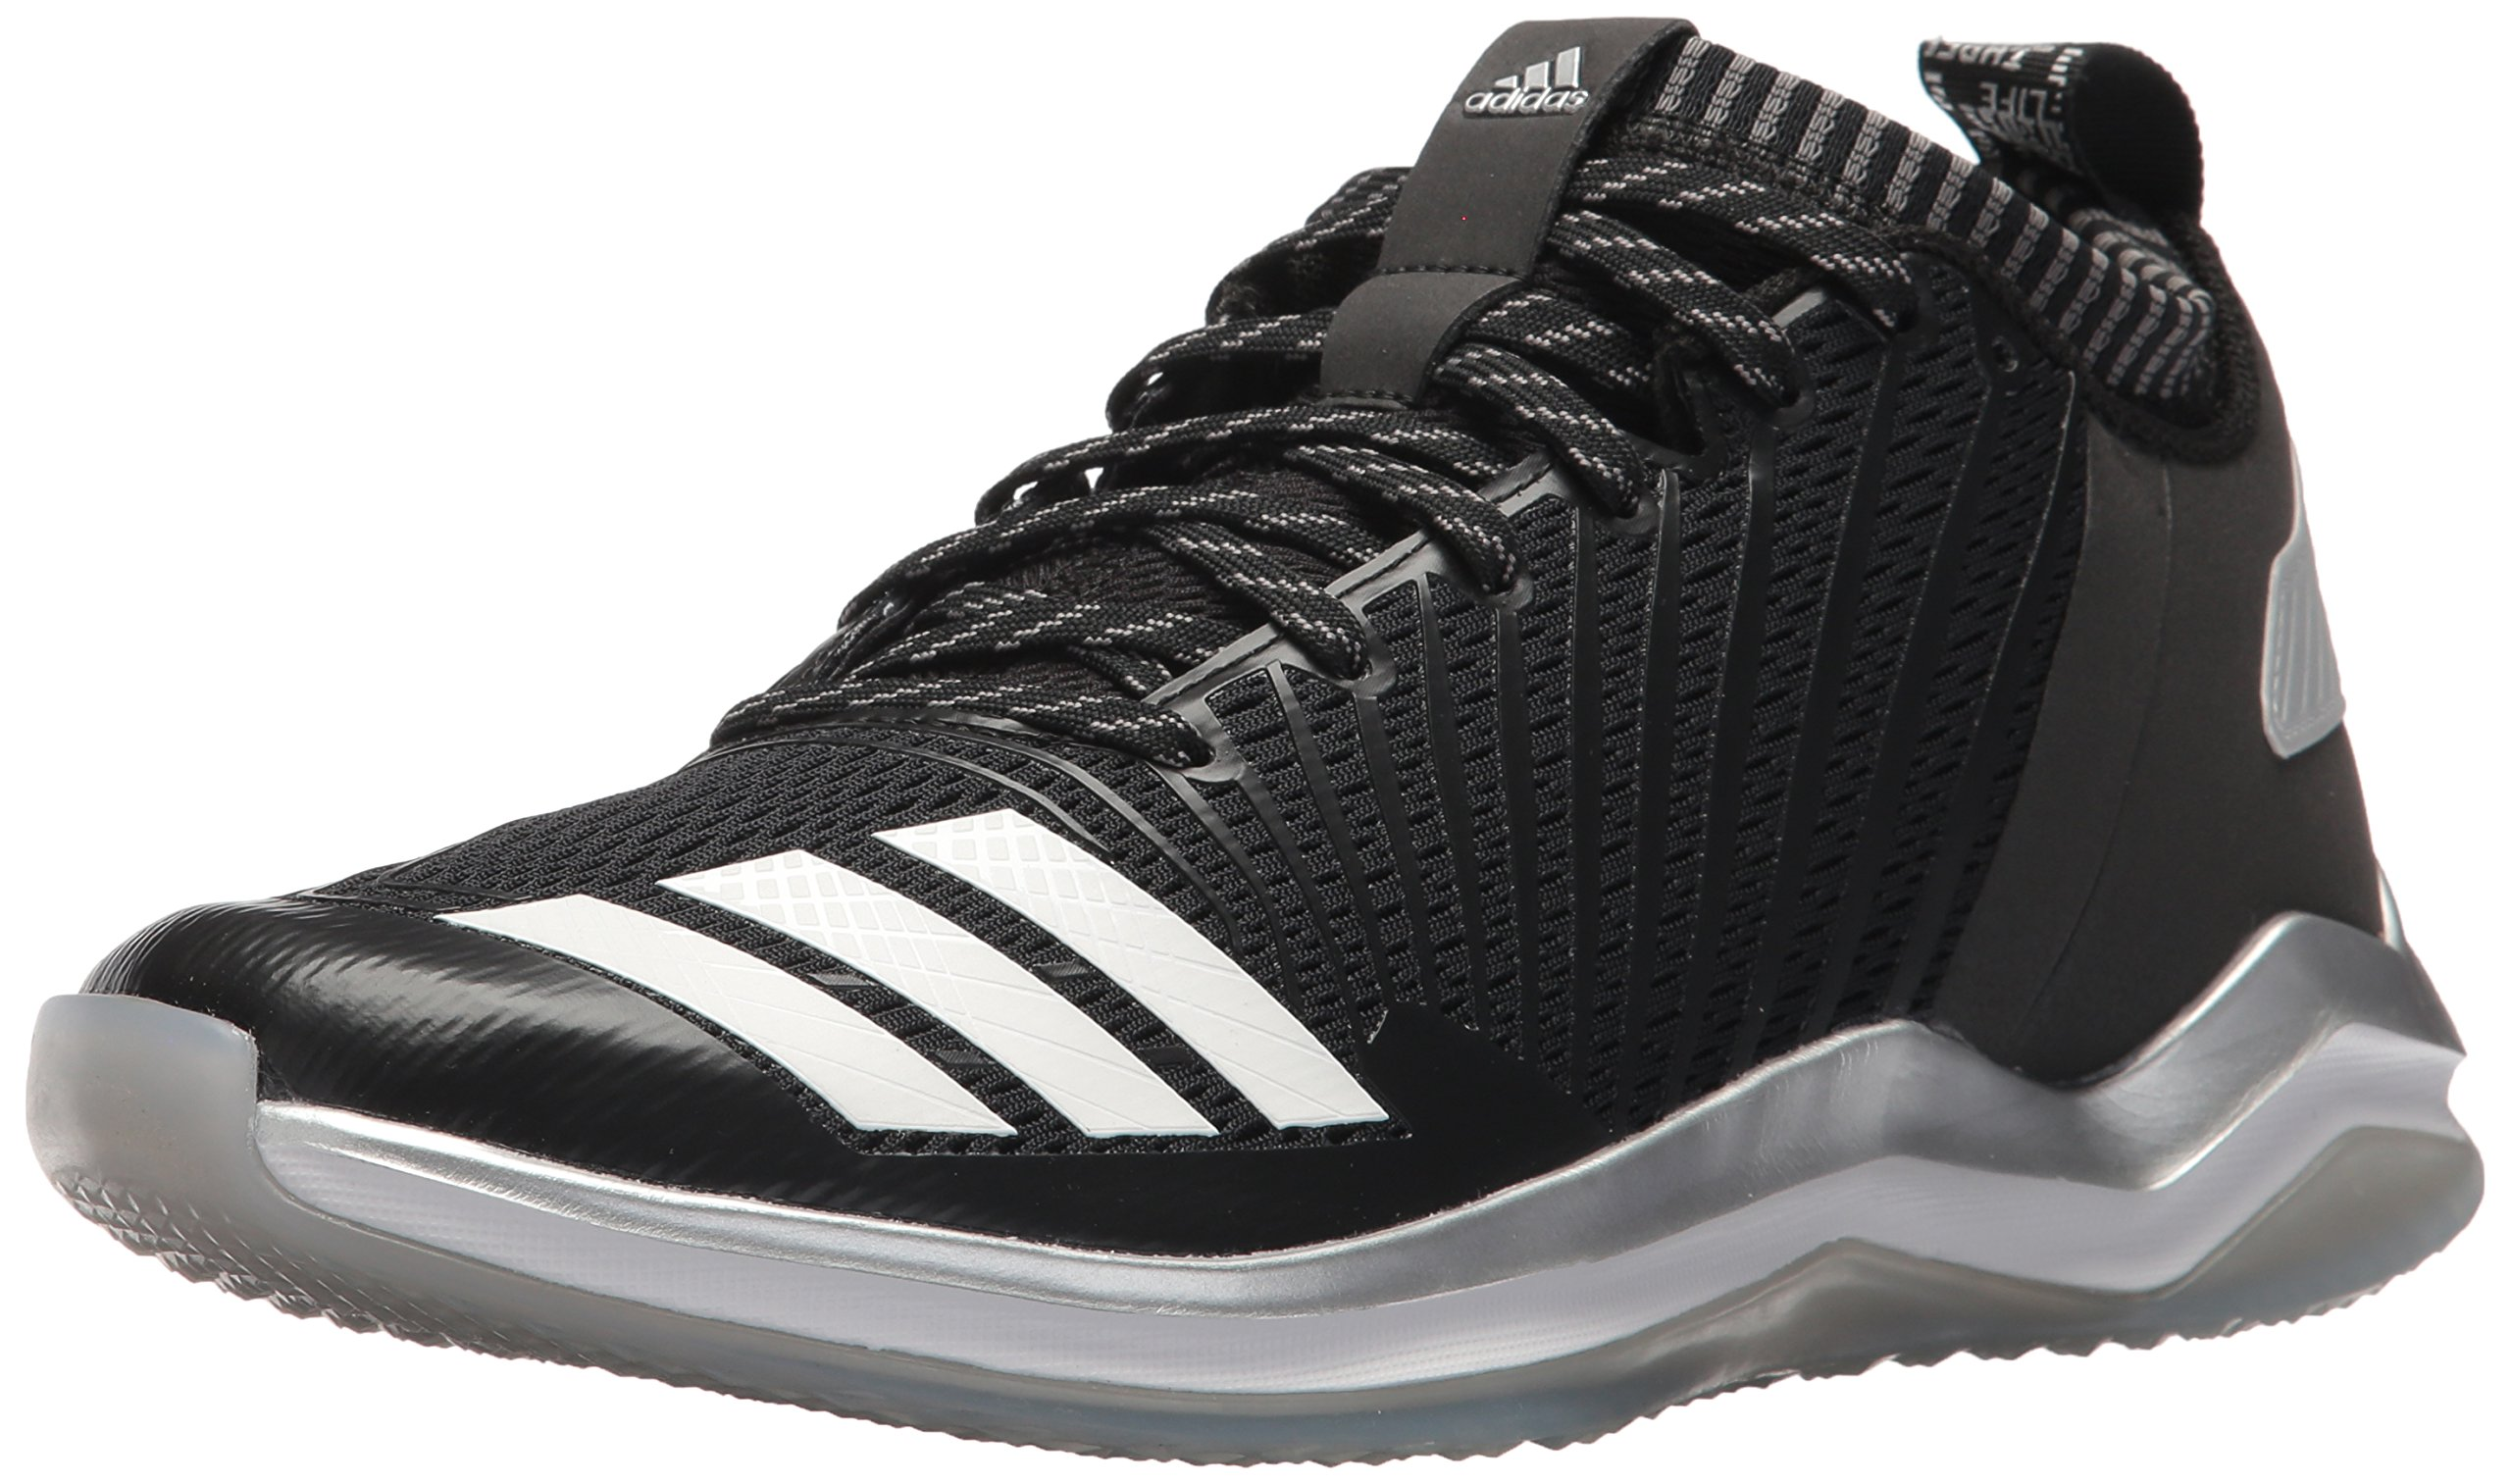 adidas Men's Freak X Carbon Mid Baseball Shoe, Black/White/Onix, 9.5 Medium US by adidas